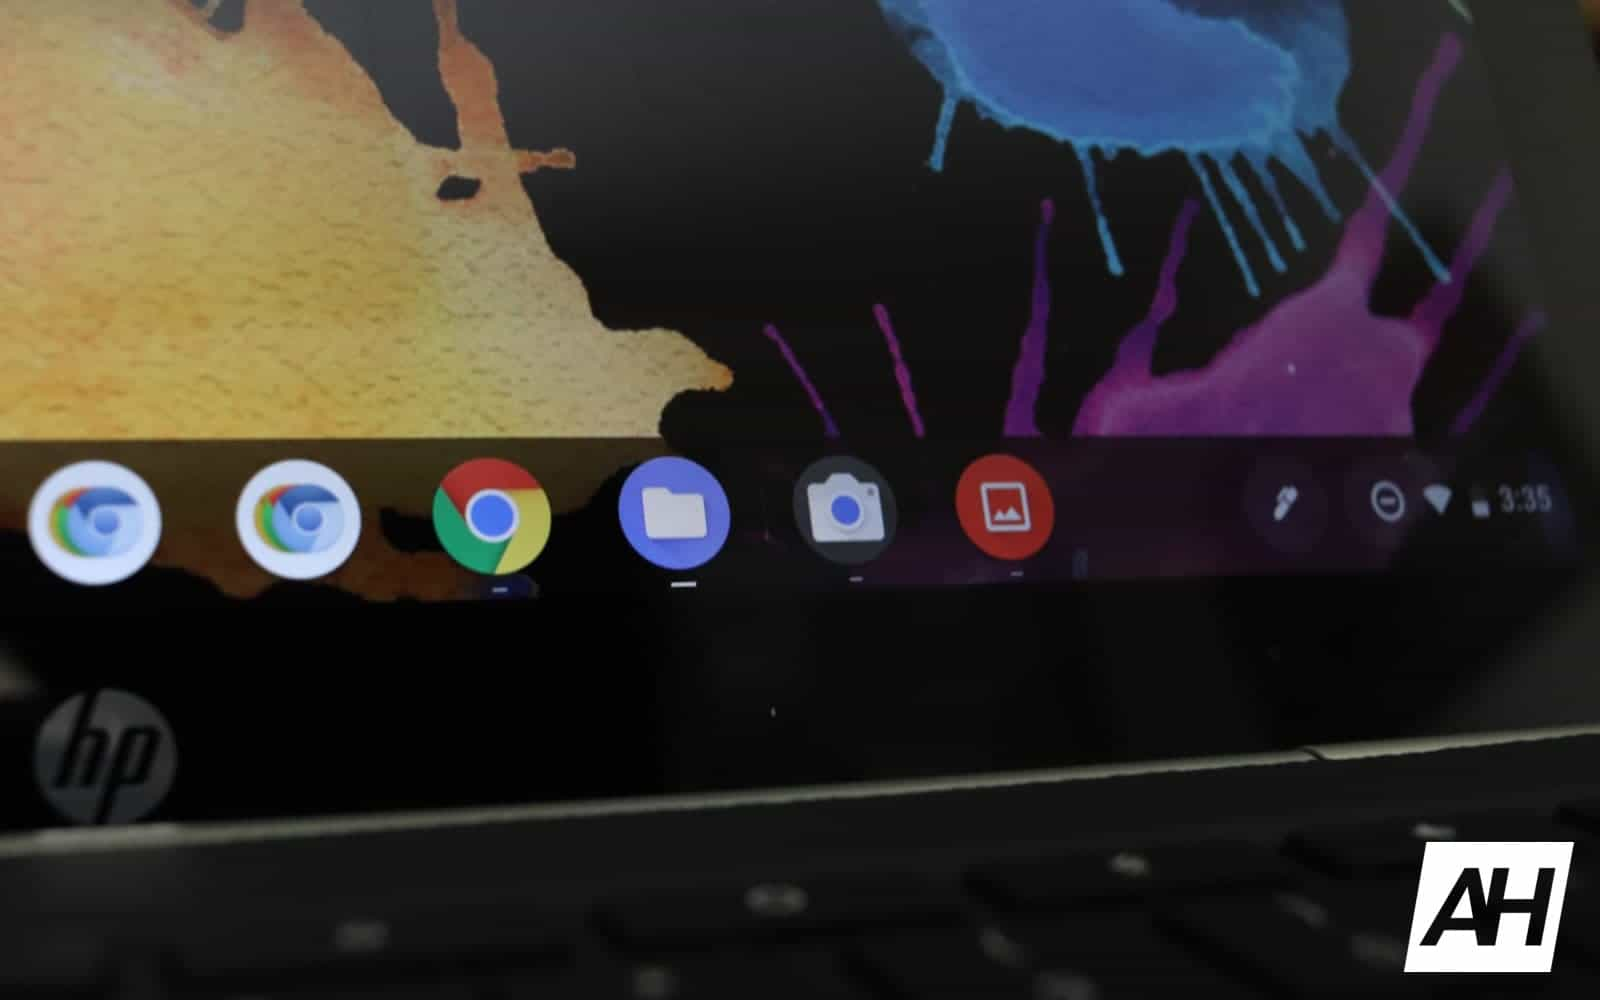 Chrome OS camera icon AH 2019